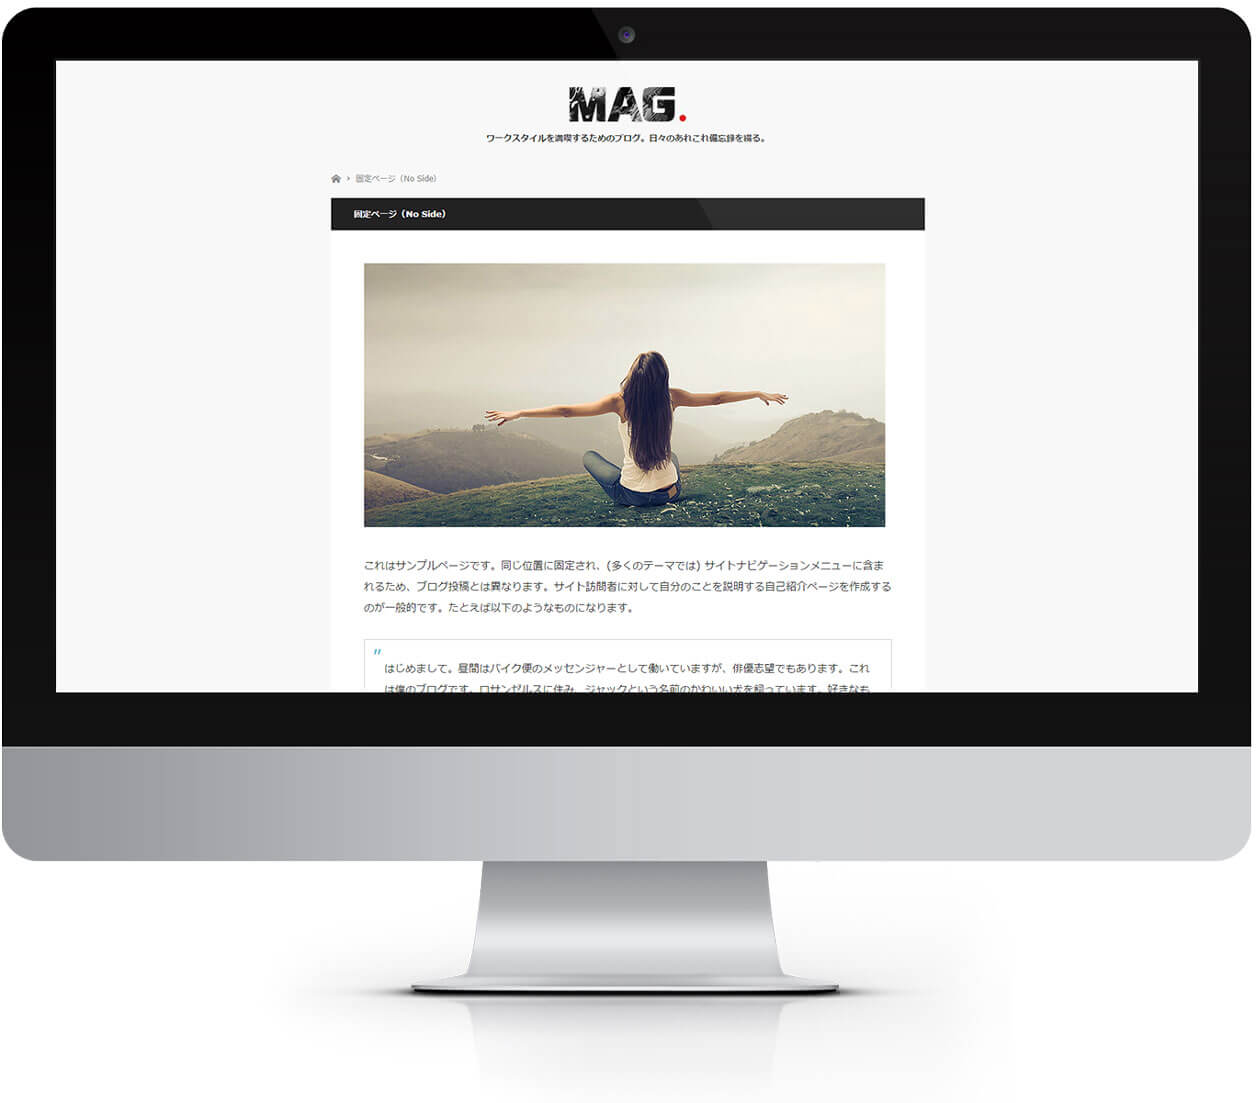 036_MAG_Desktop3